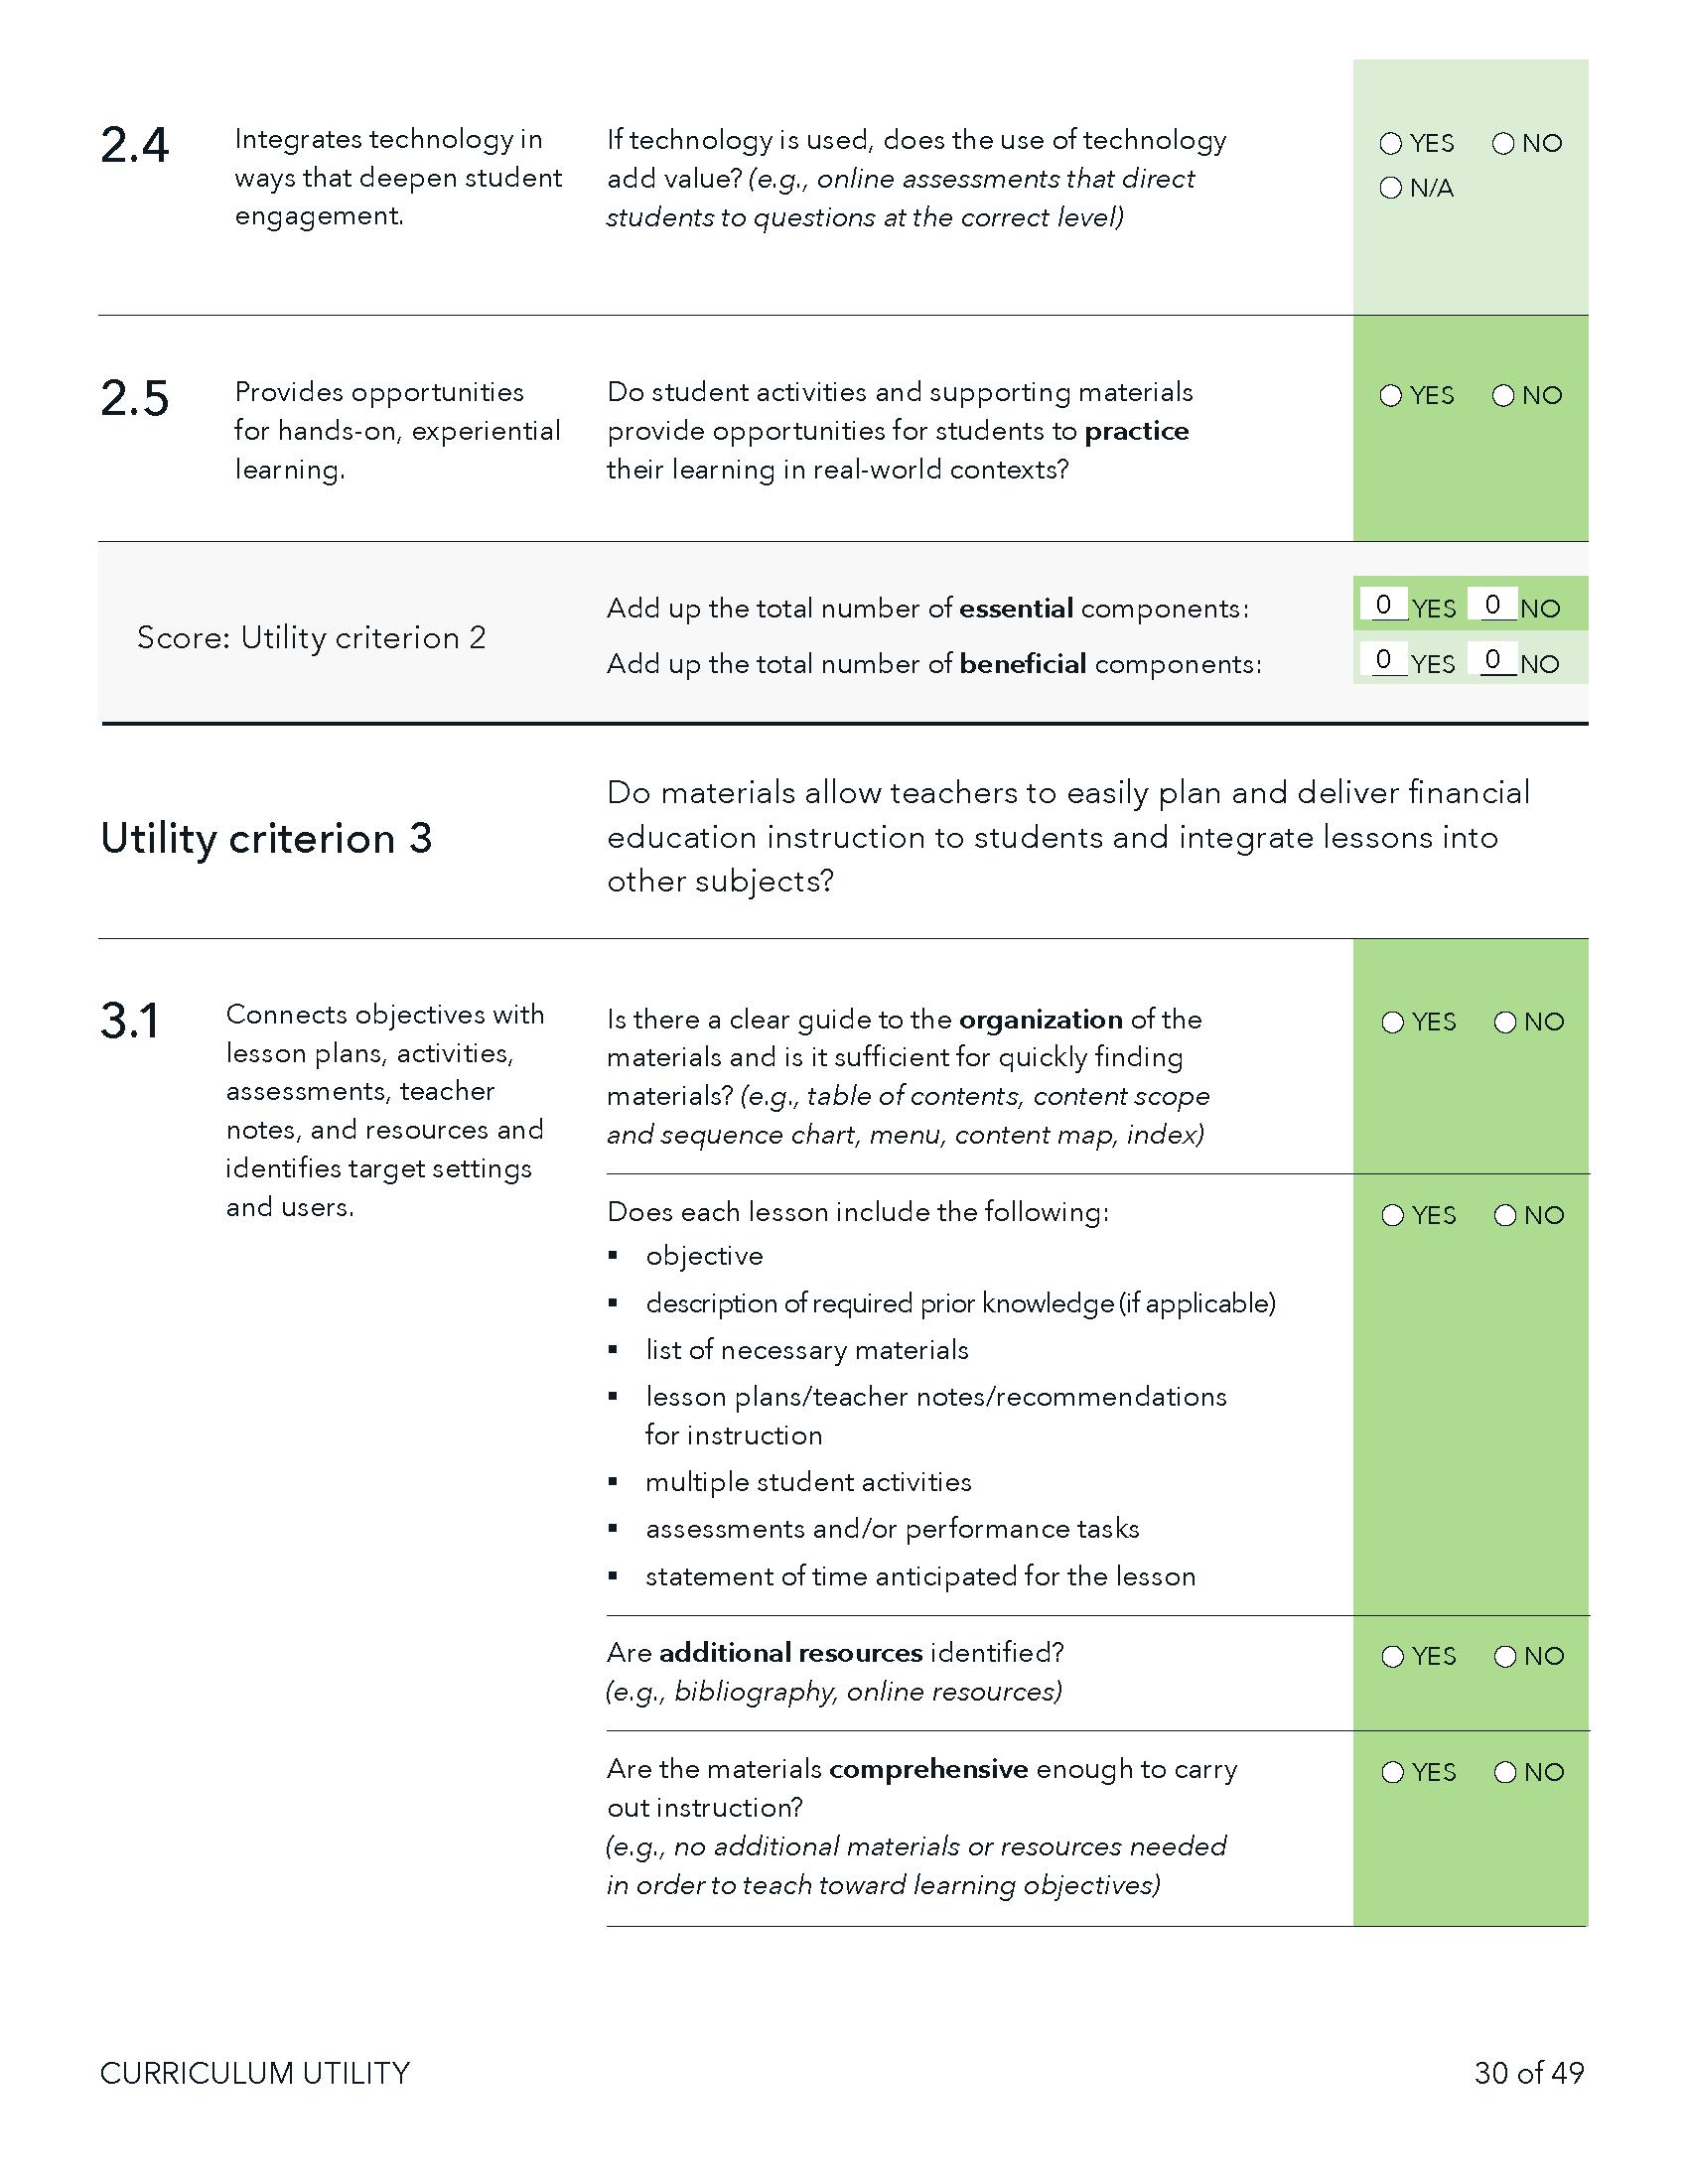 CRT utility inside